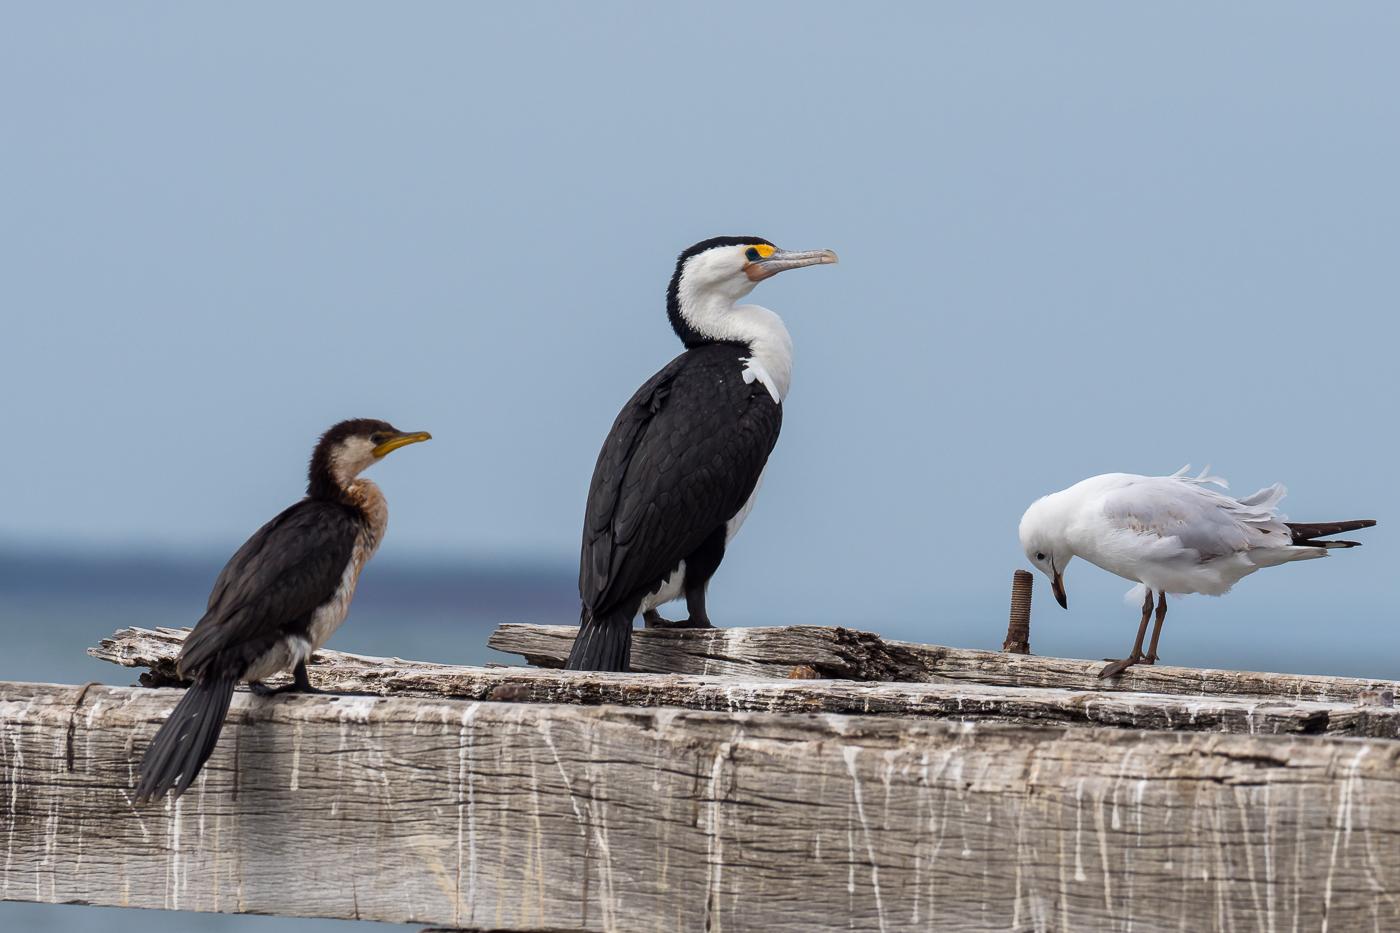 Cormorants and Gull - Bevan Hood